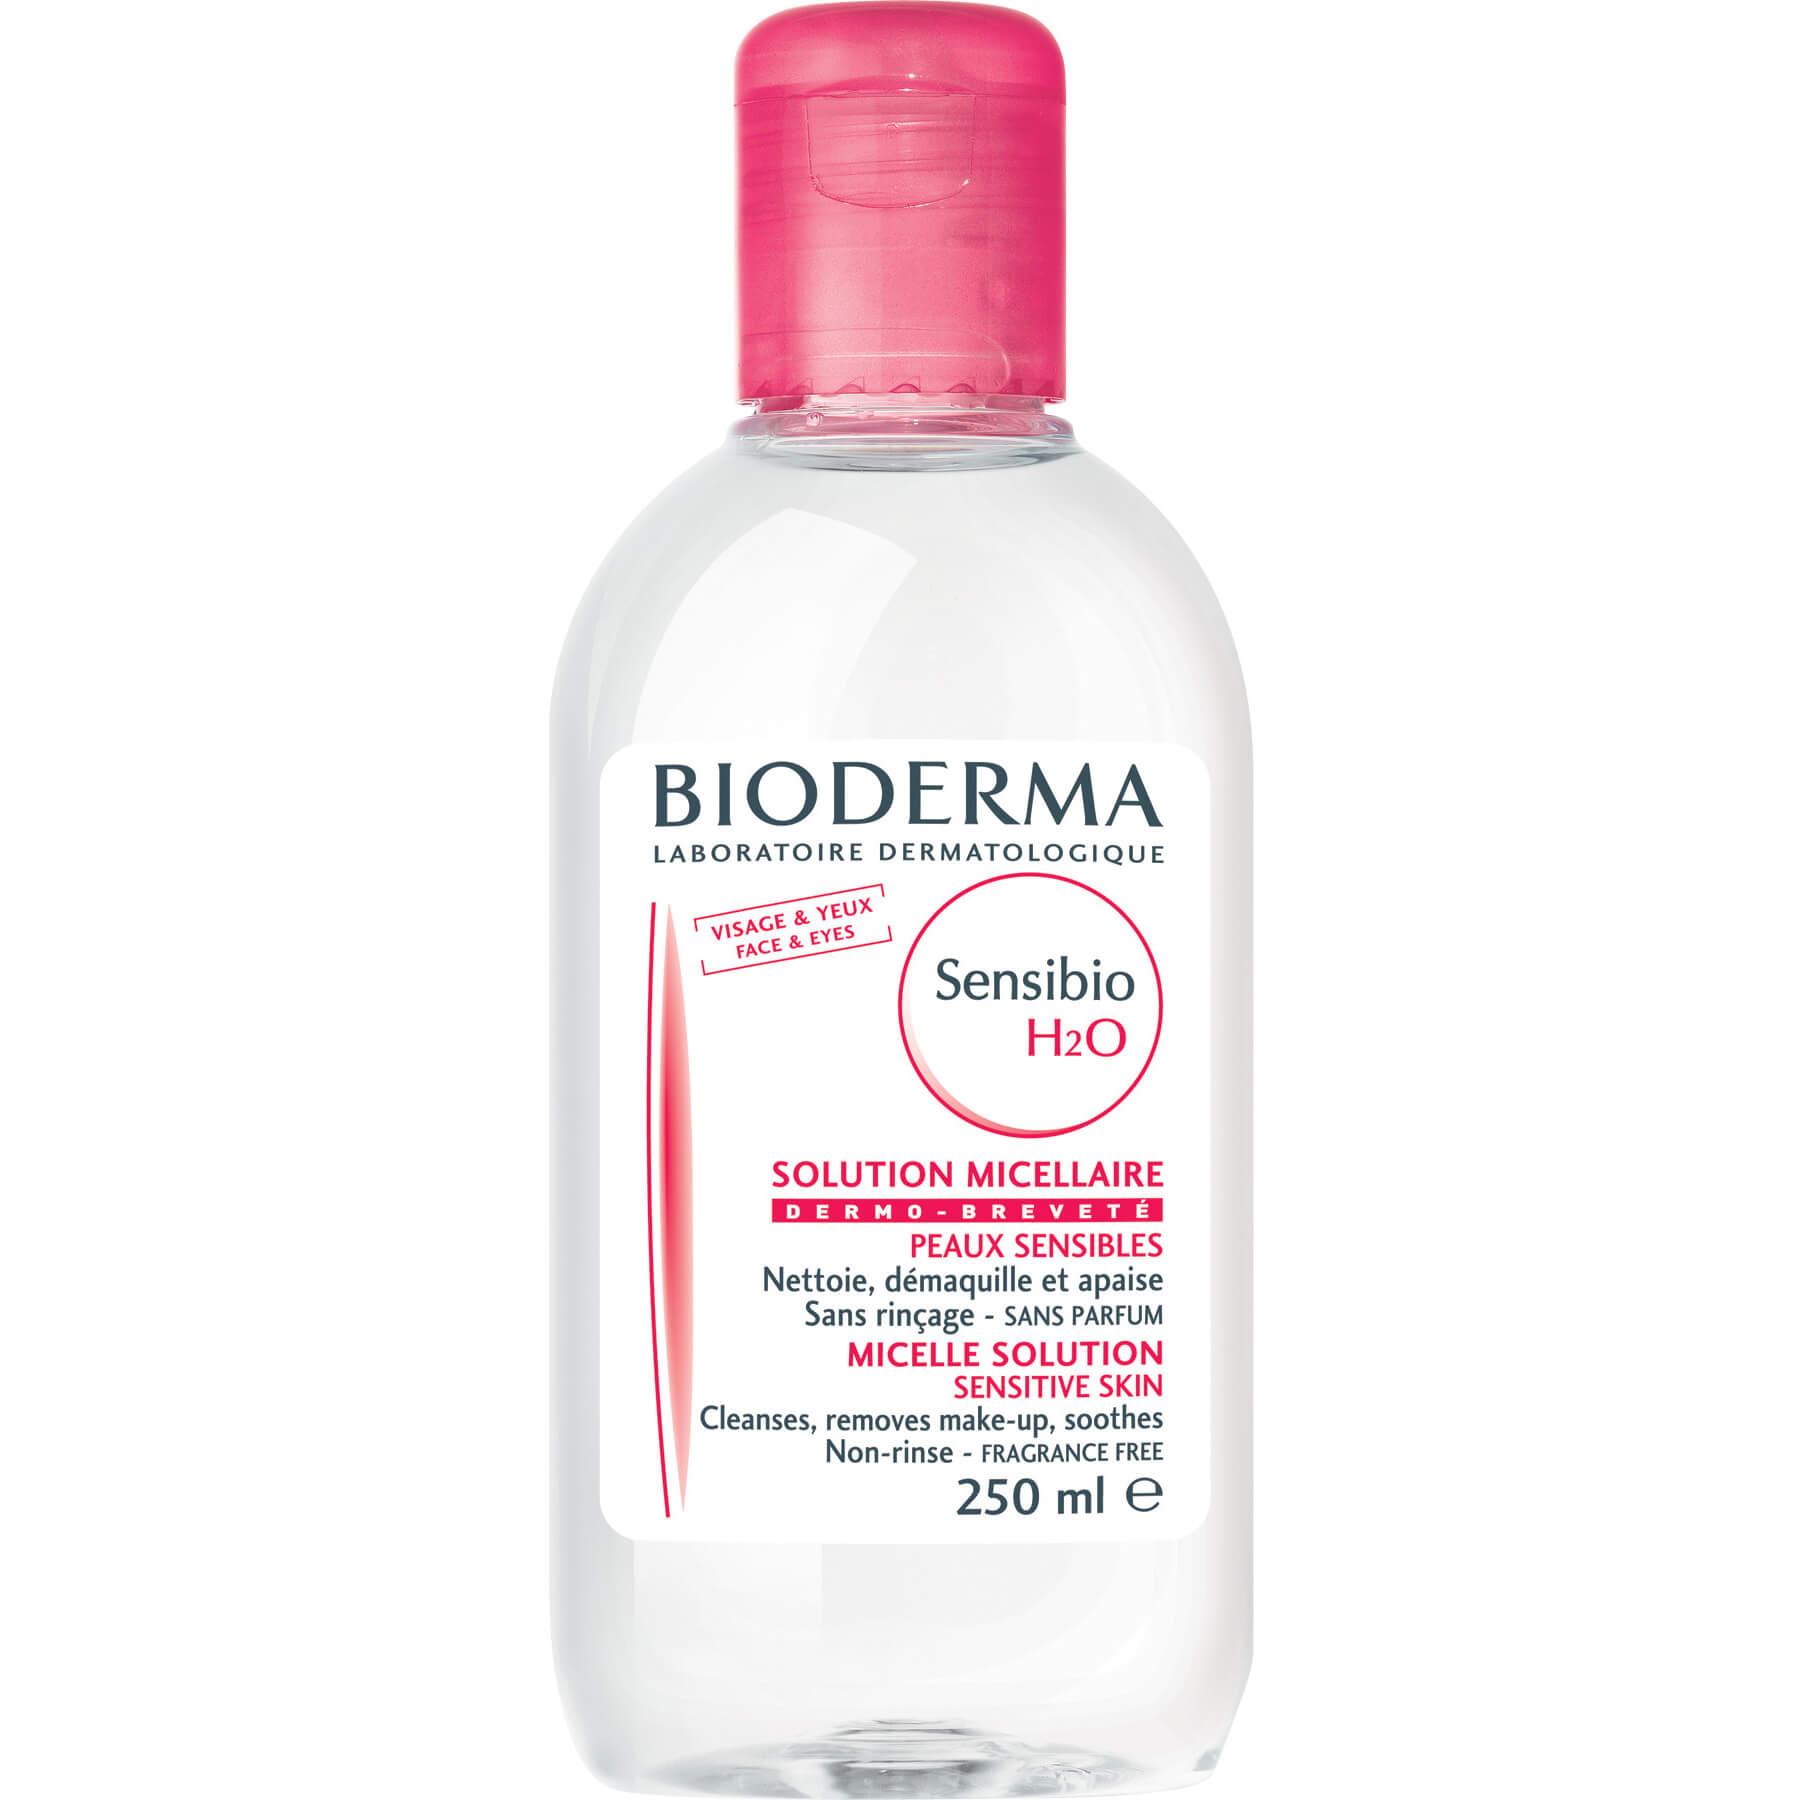 Bioderma Sensibio H2O Κολλοειδές Διάλυμα Καθαρισμού & Ντεμακιγιάζ Προσώπου & Ματιών 250ml Promo -20%